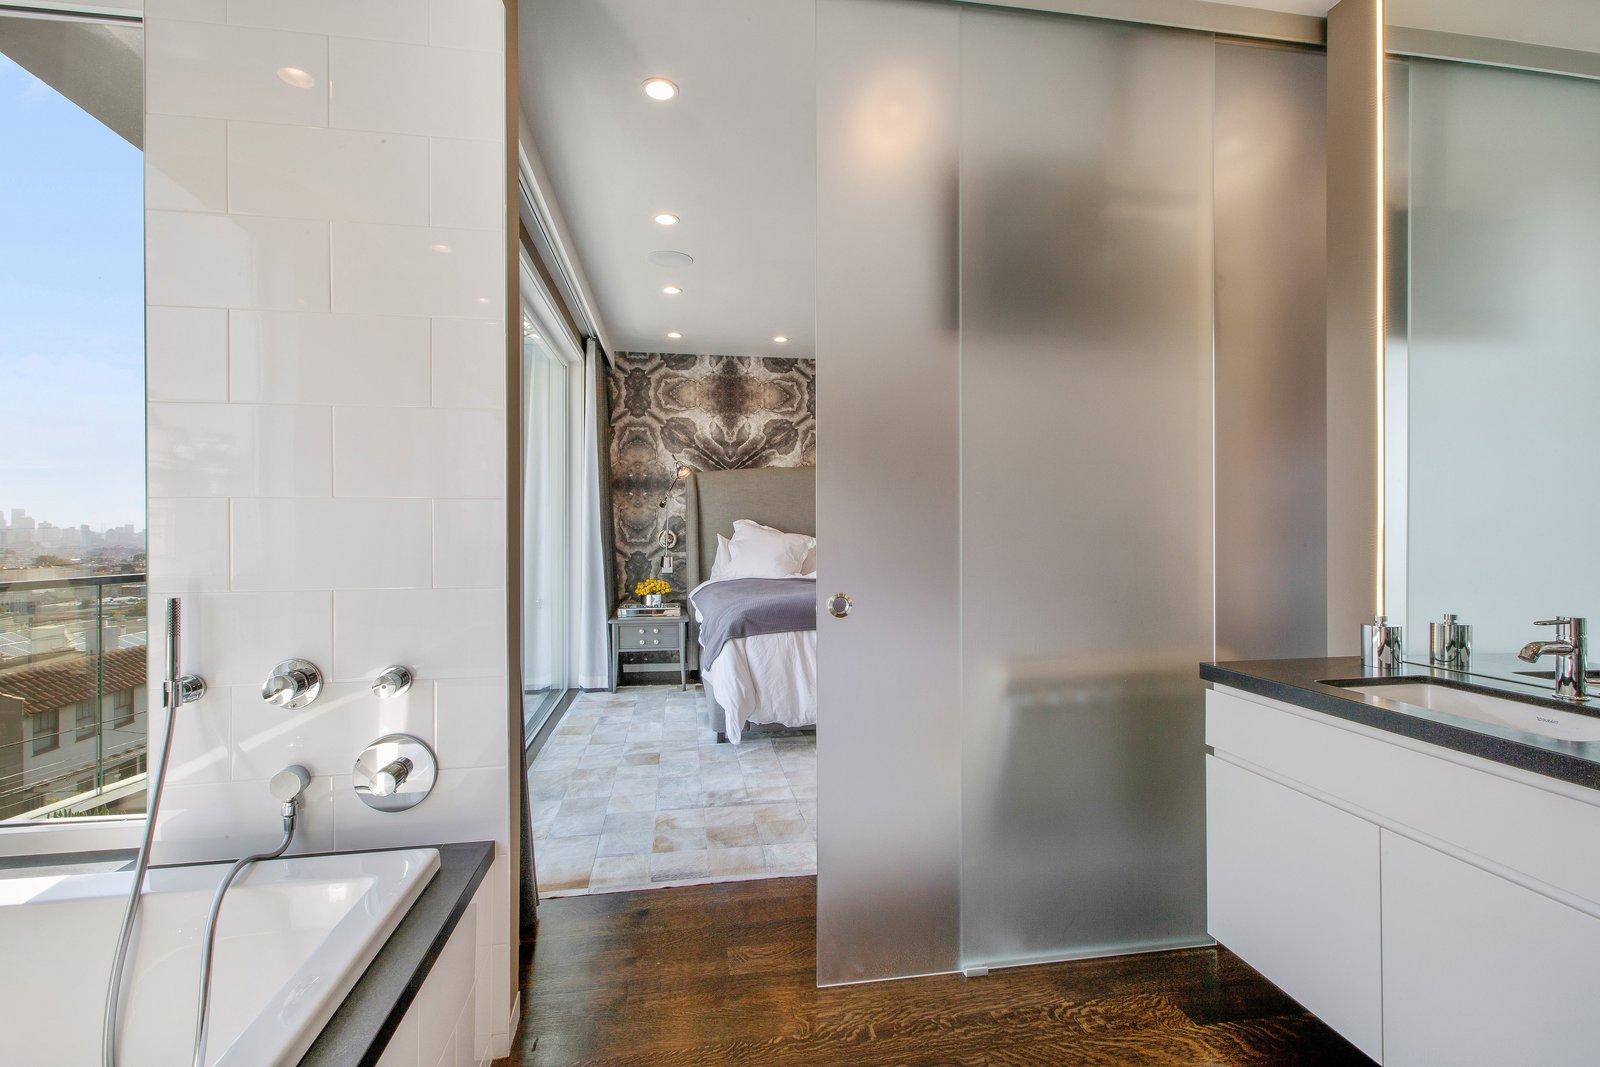 Bath Room, Granite Counter, Drop In Tub, Medium Hardwood Floor, Ceiling Lighting, and Undermount Sink  LEED Platinum House in SF by DNM Architecture